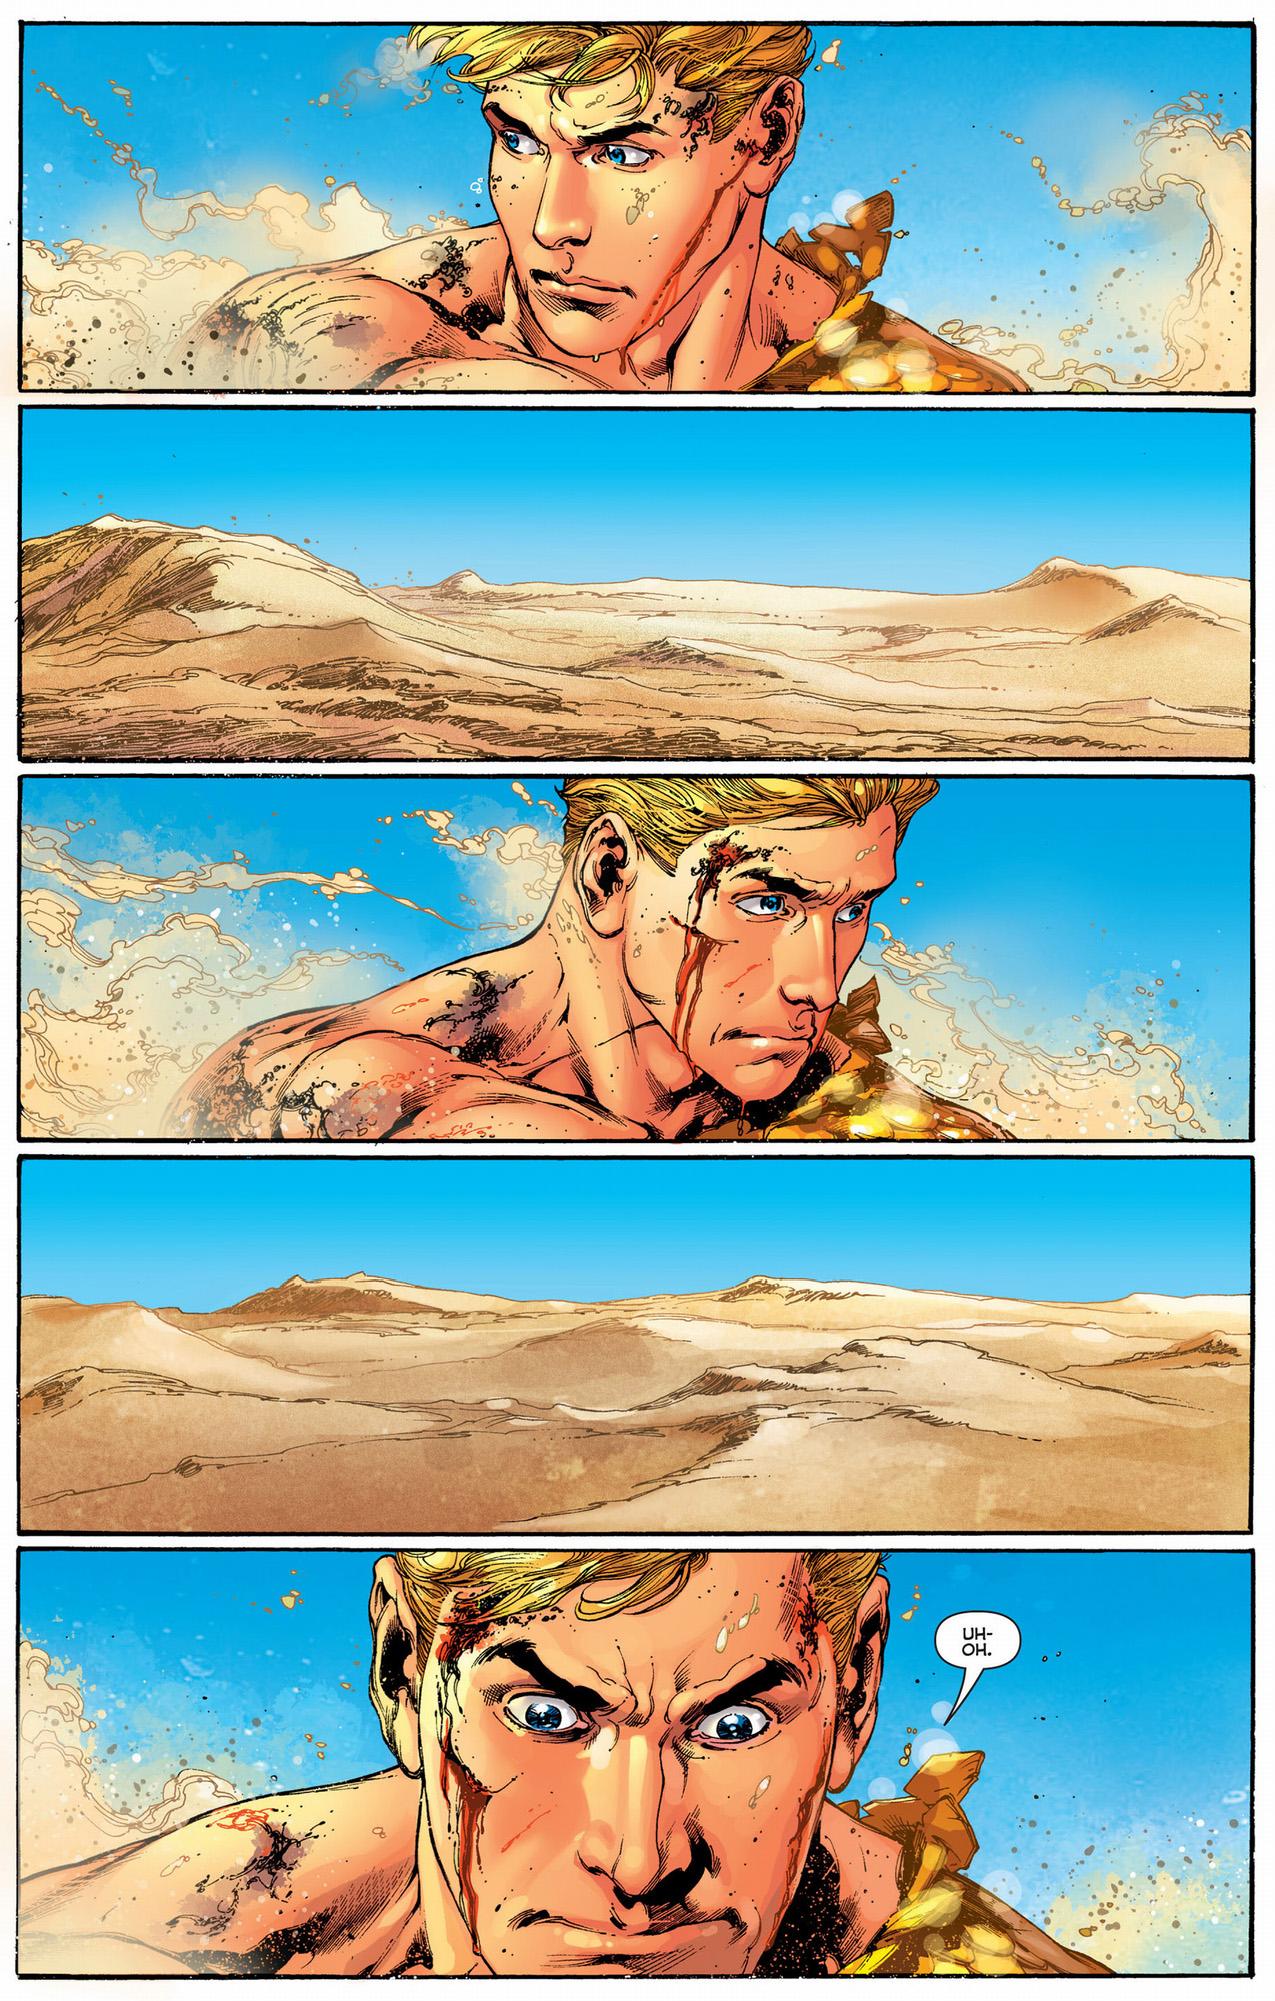 aquaman is stuck in a desert